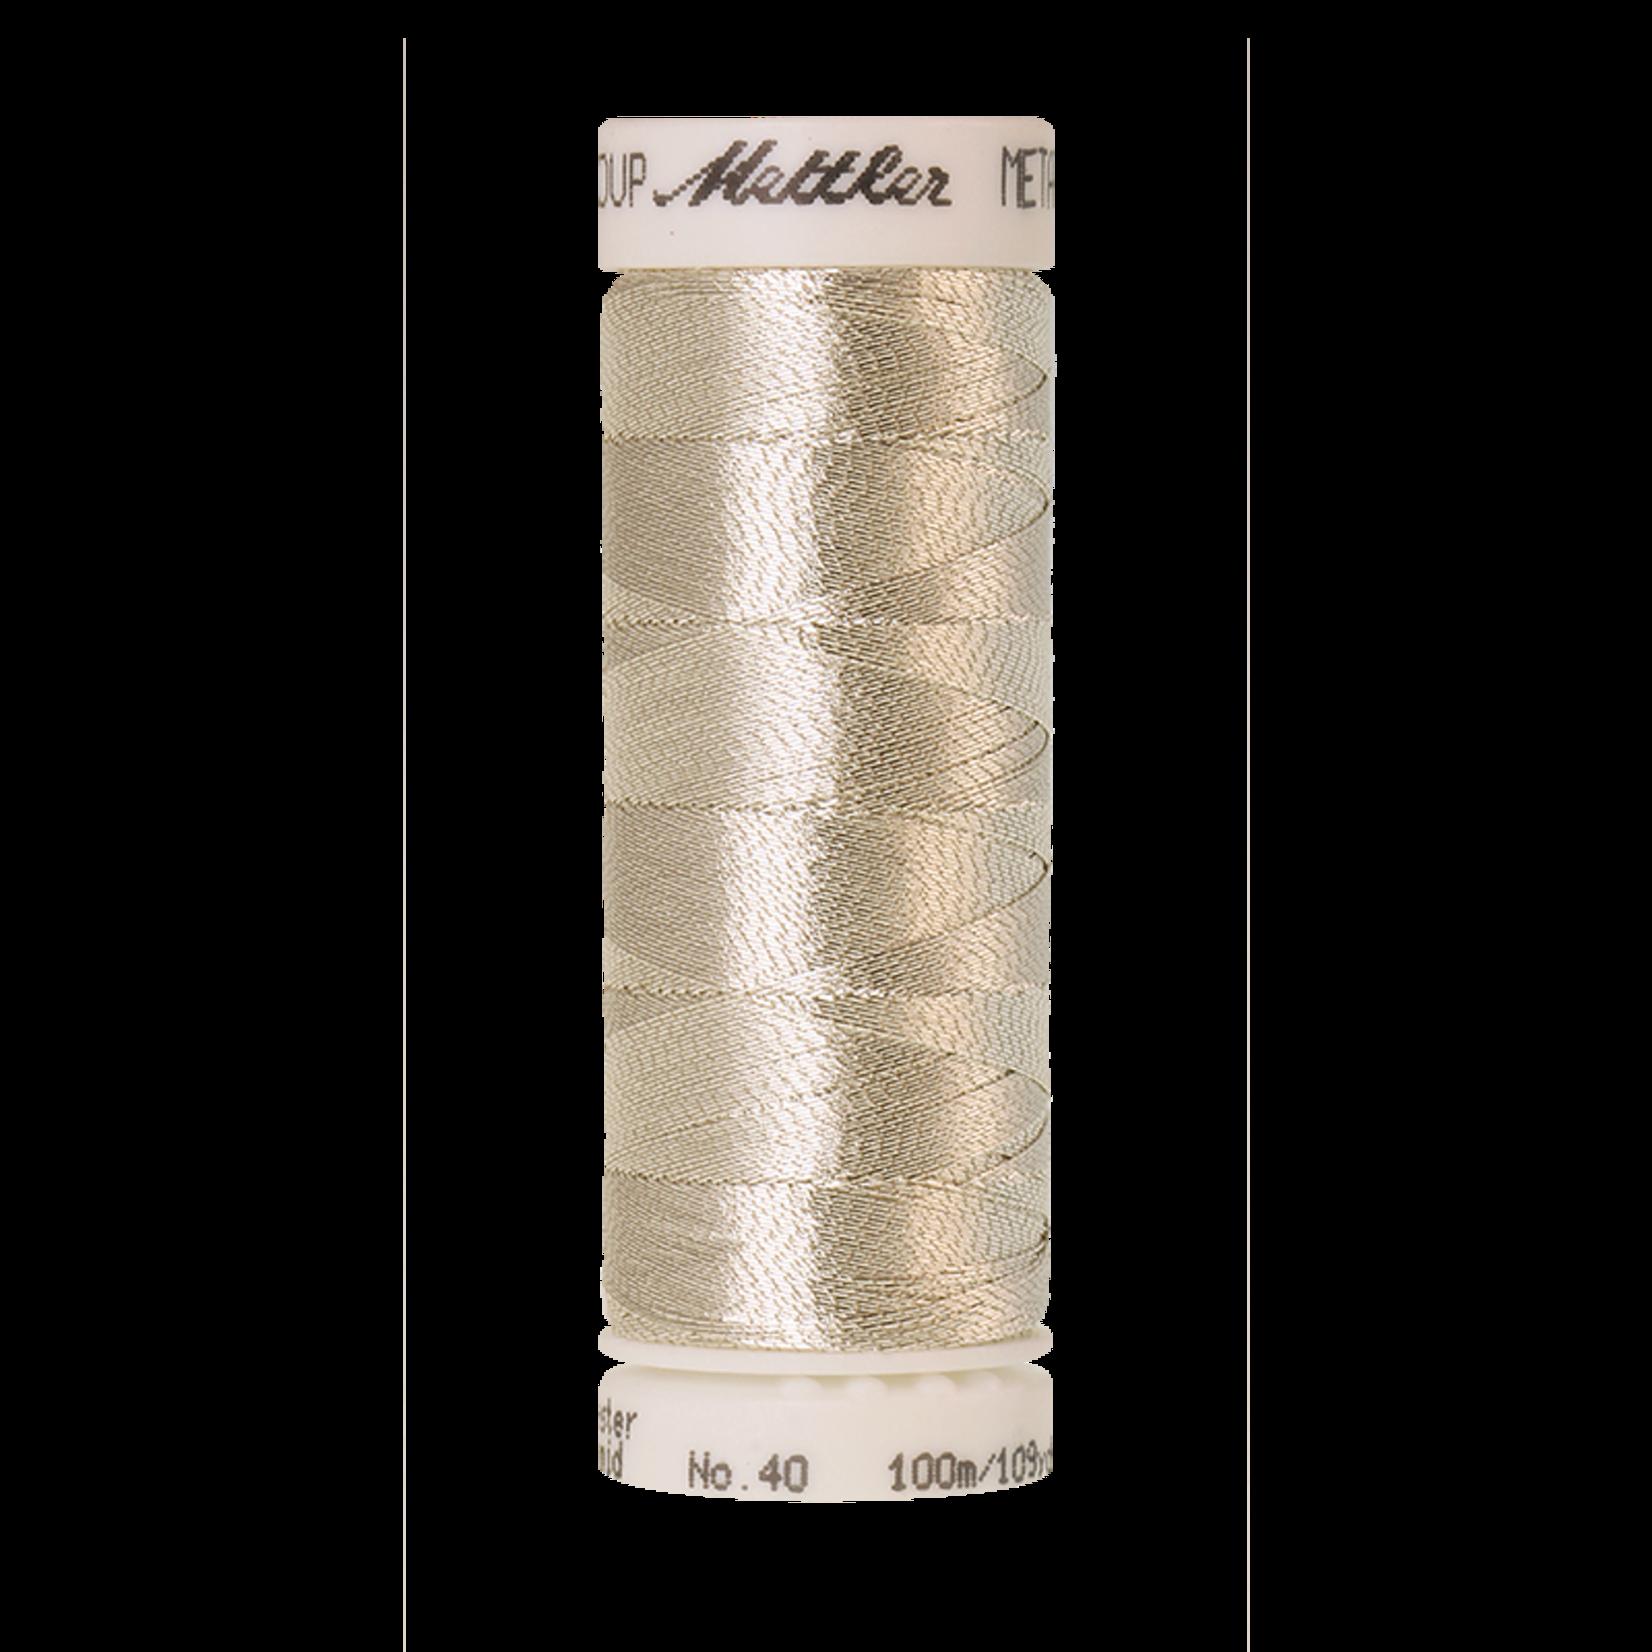 Amann Mettler Metallic - #40 - 100 m - 2701 Silver